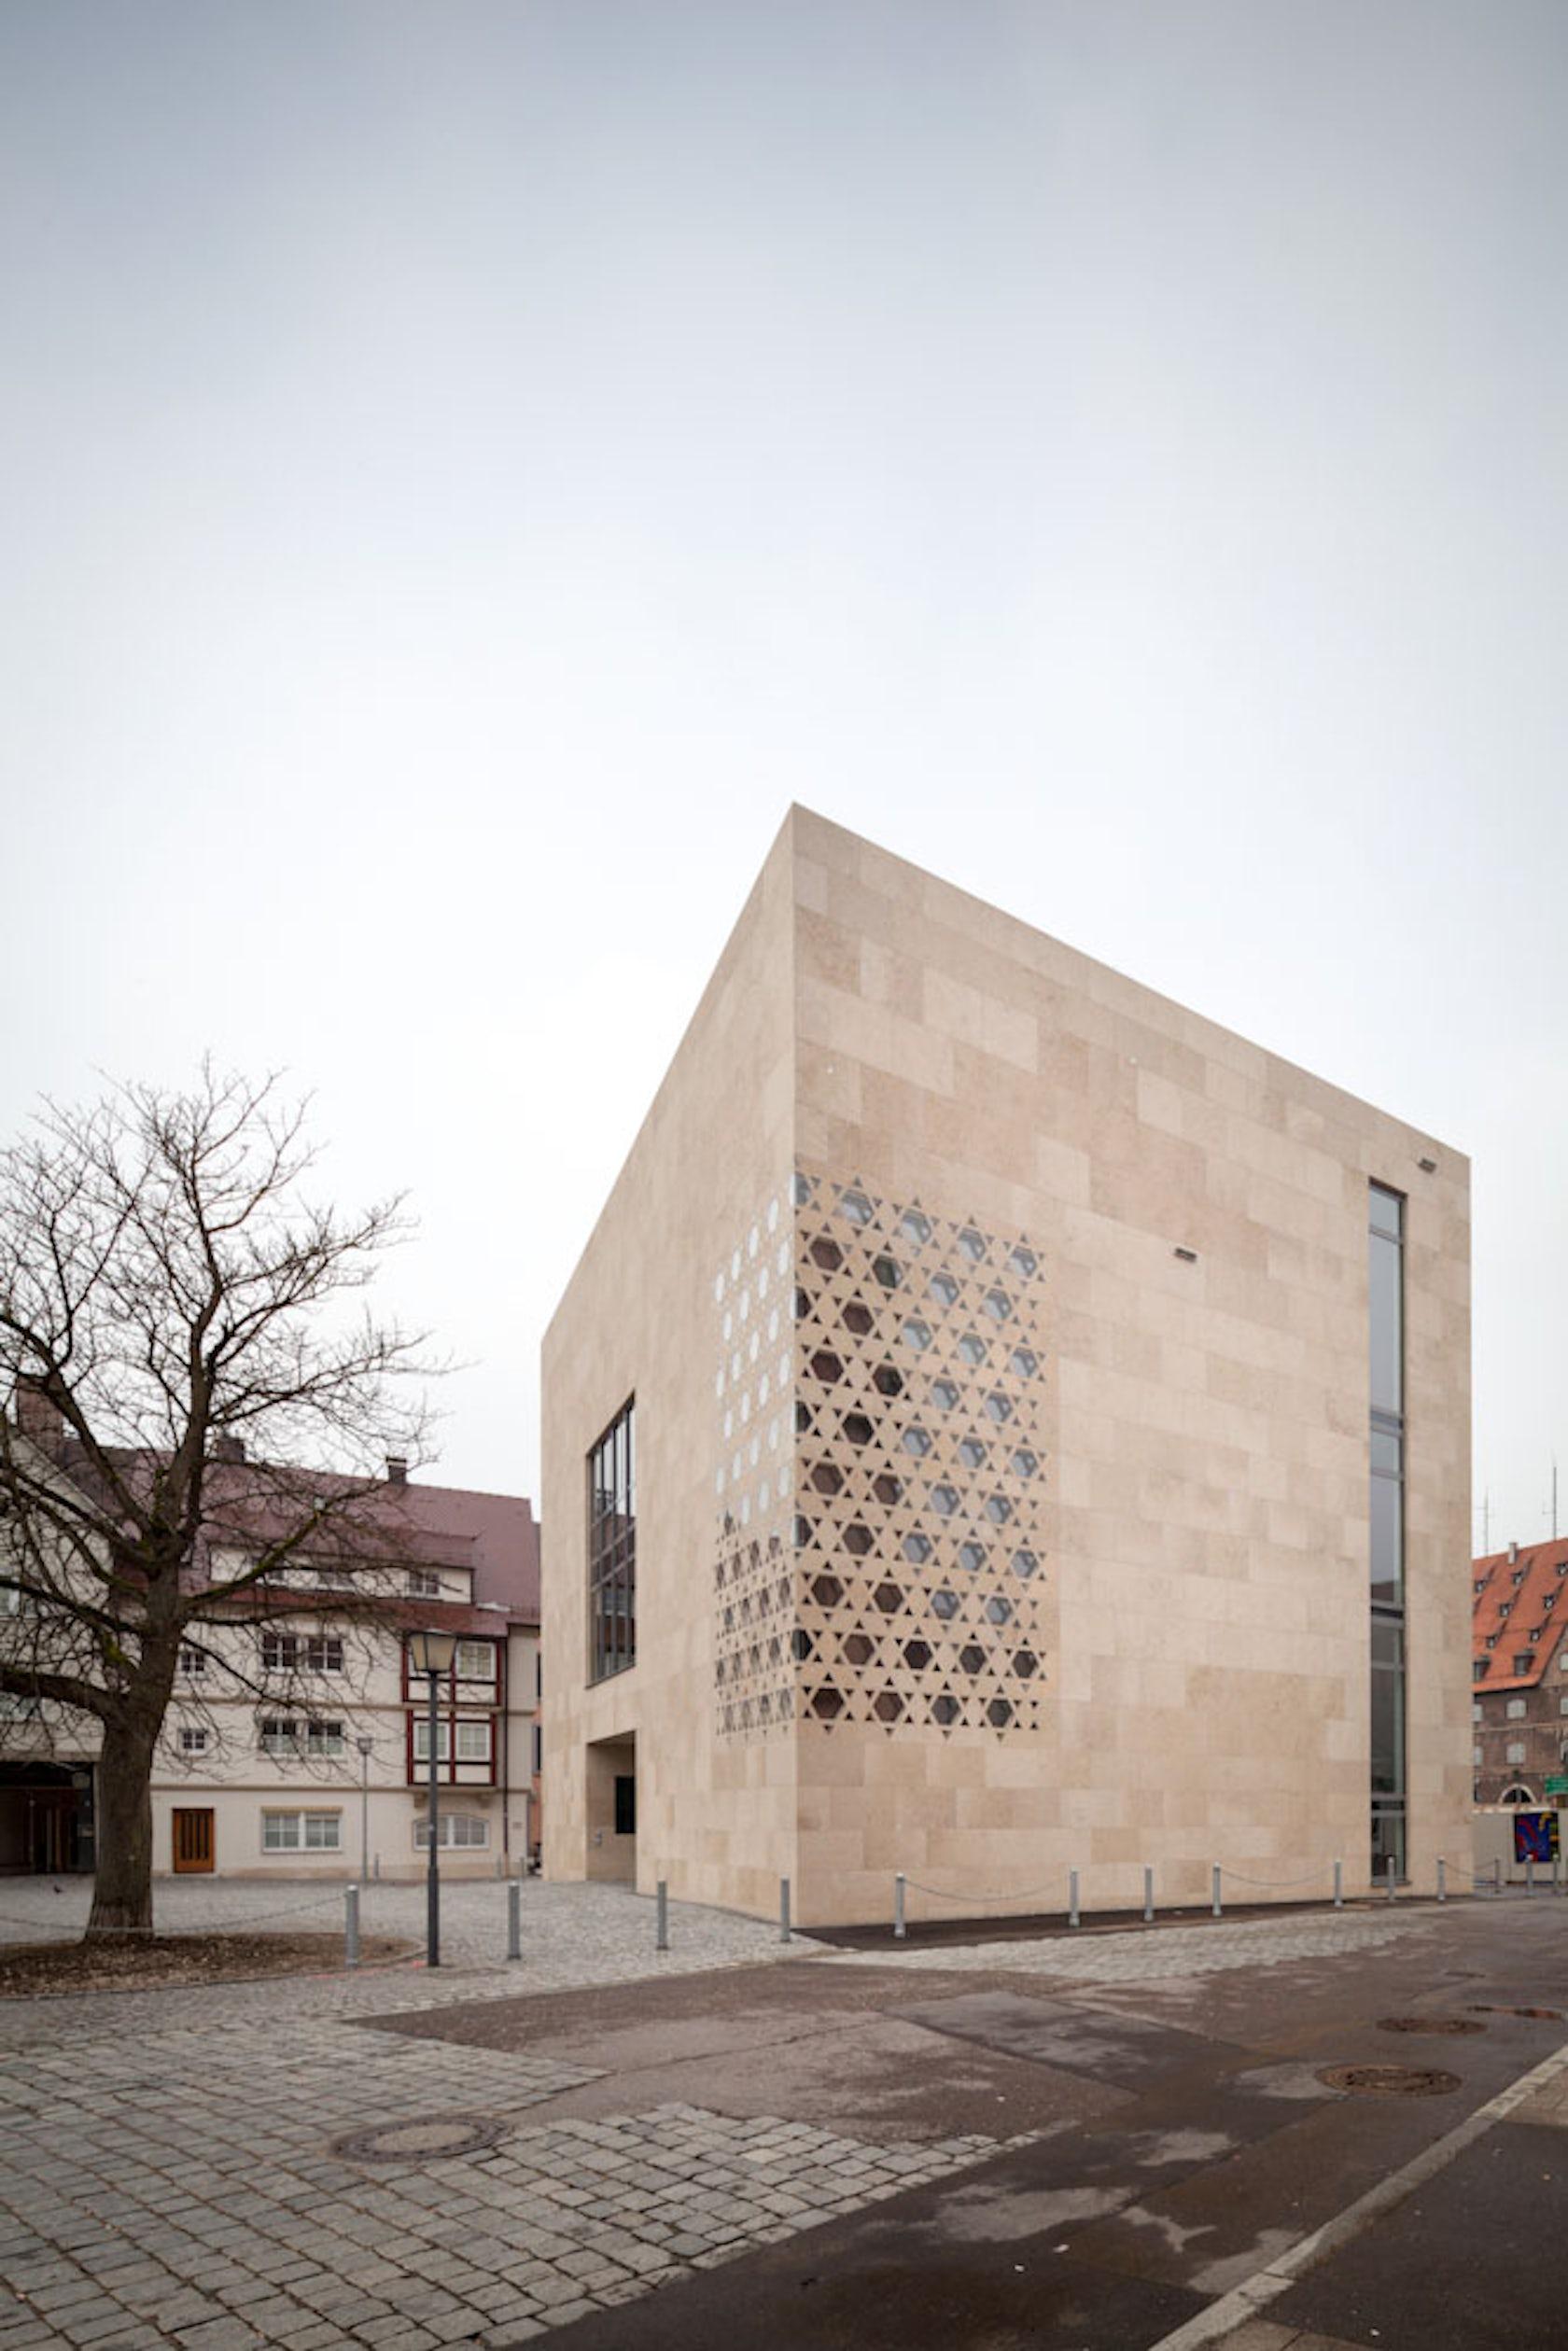 ulm synagogue kister scheithauer gross architects architizer. Black Bedroom Furniture Sets. Home Design Ideas